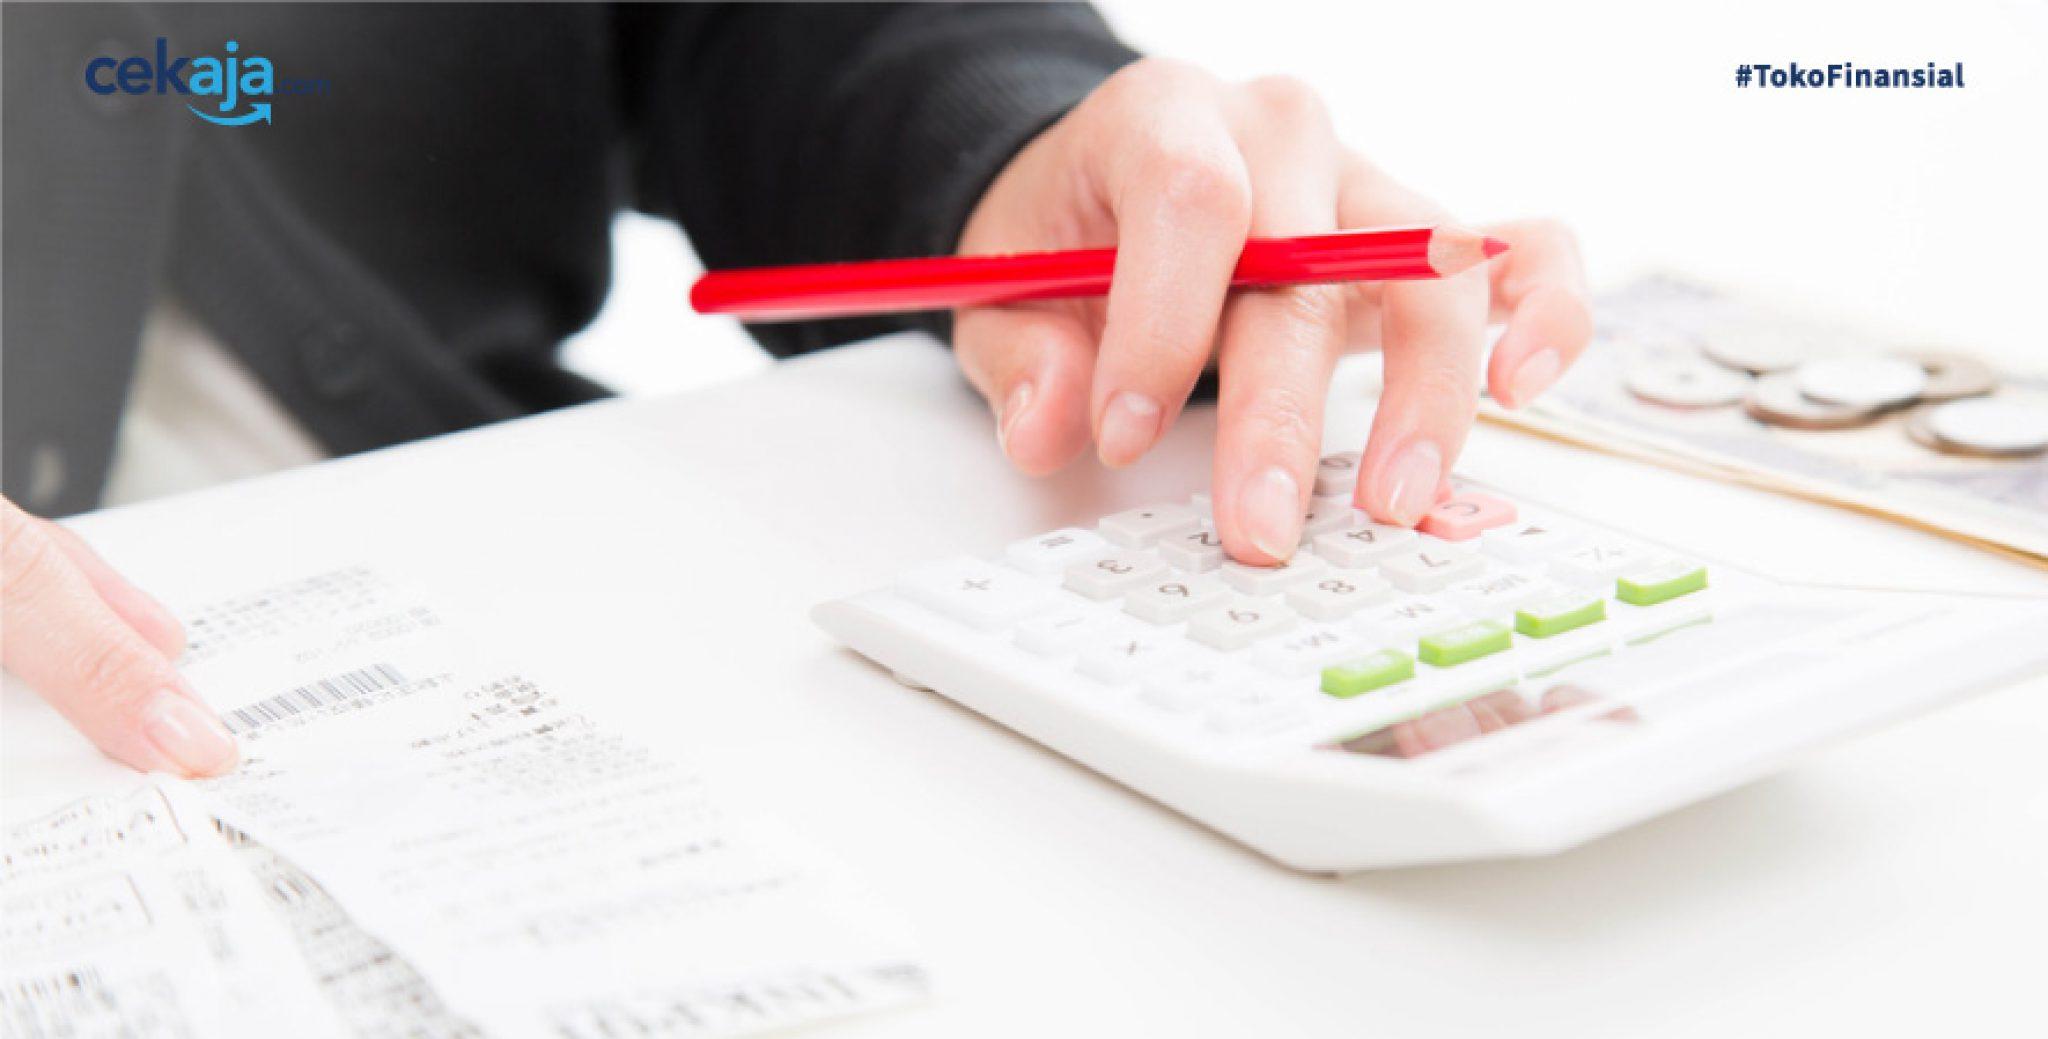 tips belanja hemat _ kartu kredit - CekAja.com